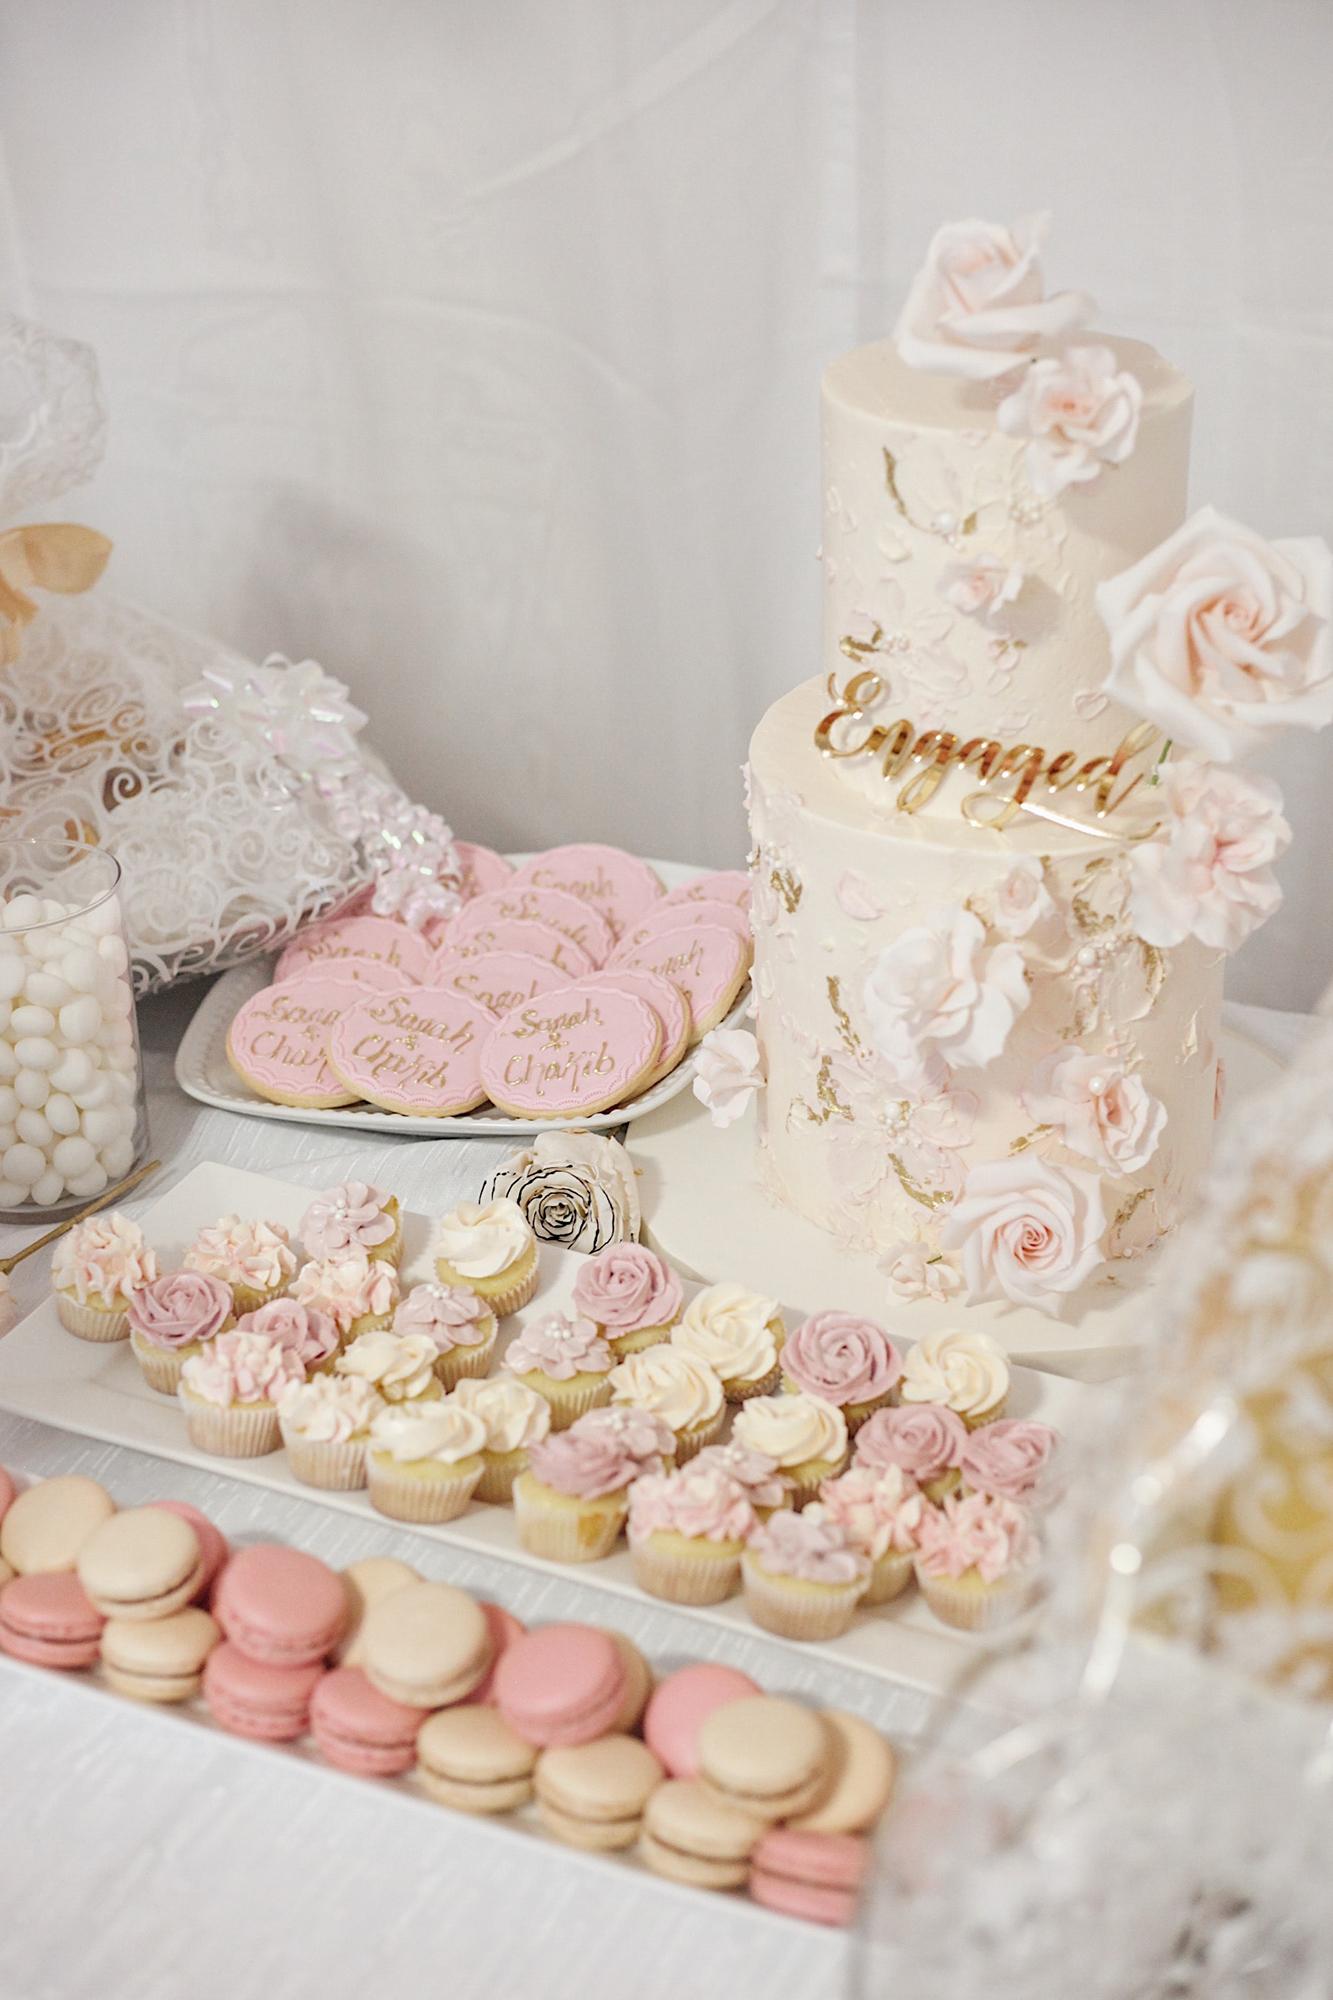 The Benefits of Online Wedding Planning